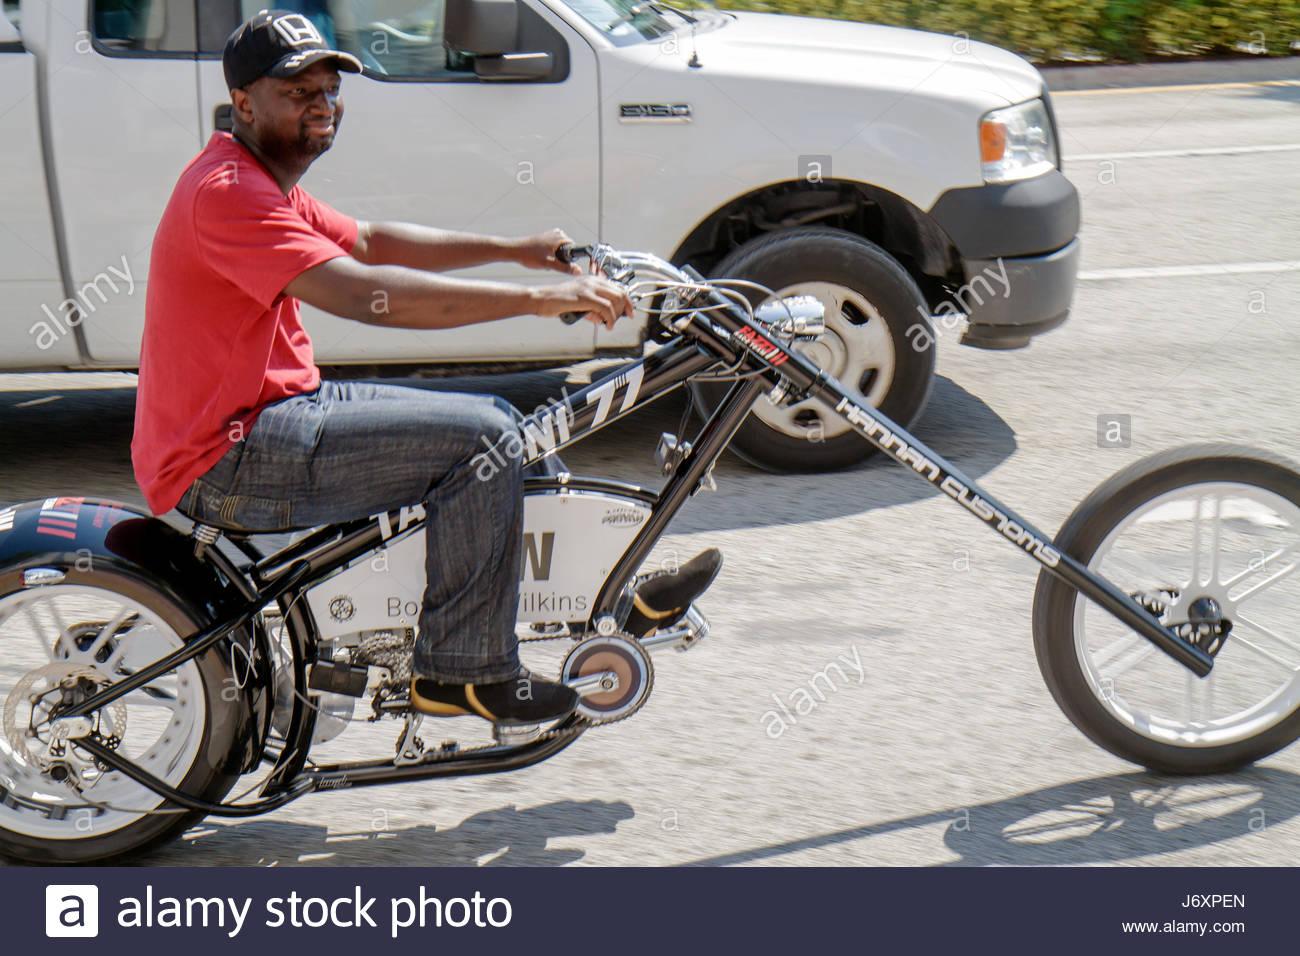 Miami Beach Florida 5th Fifth Street customized bicycle imitation motorcycle chopper pedal Black man - Stock Image